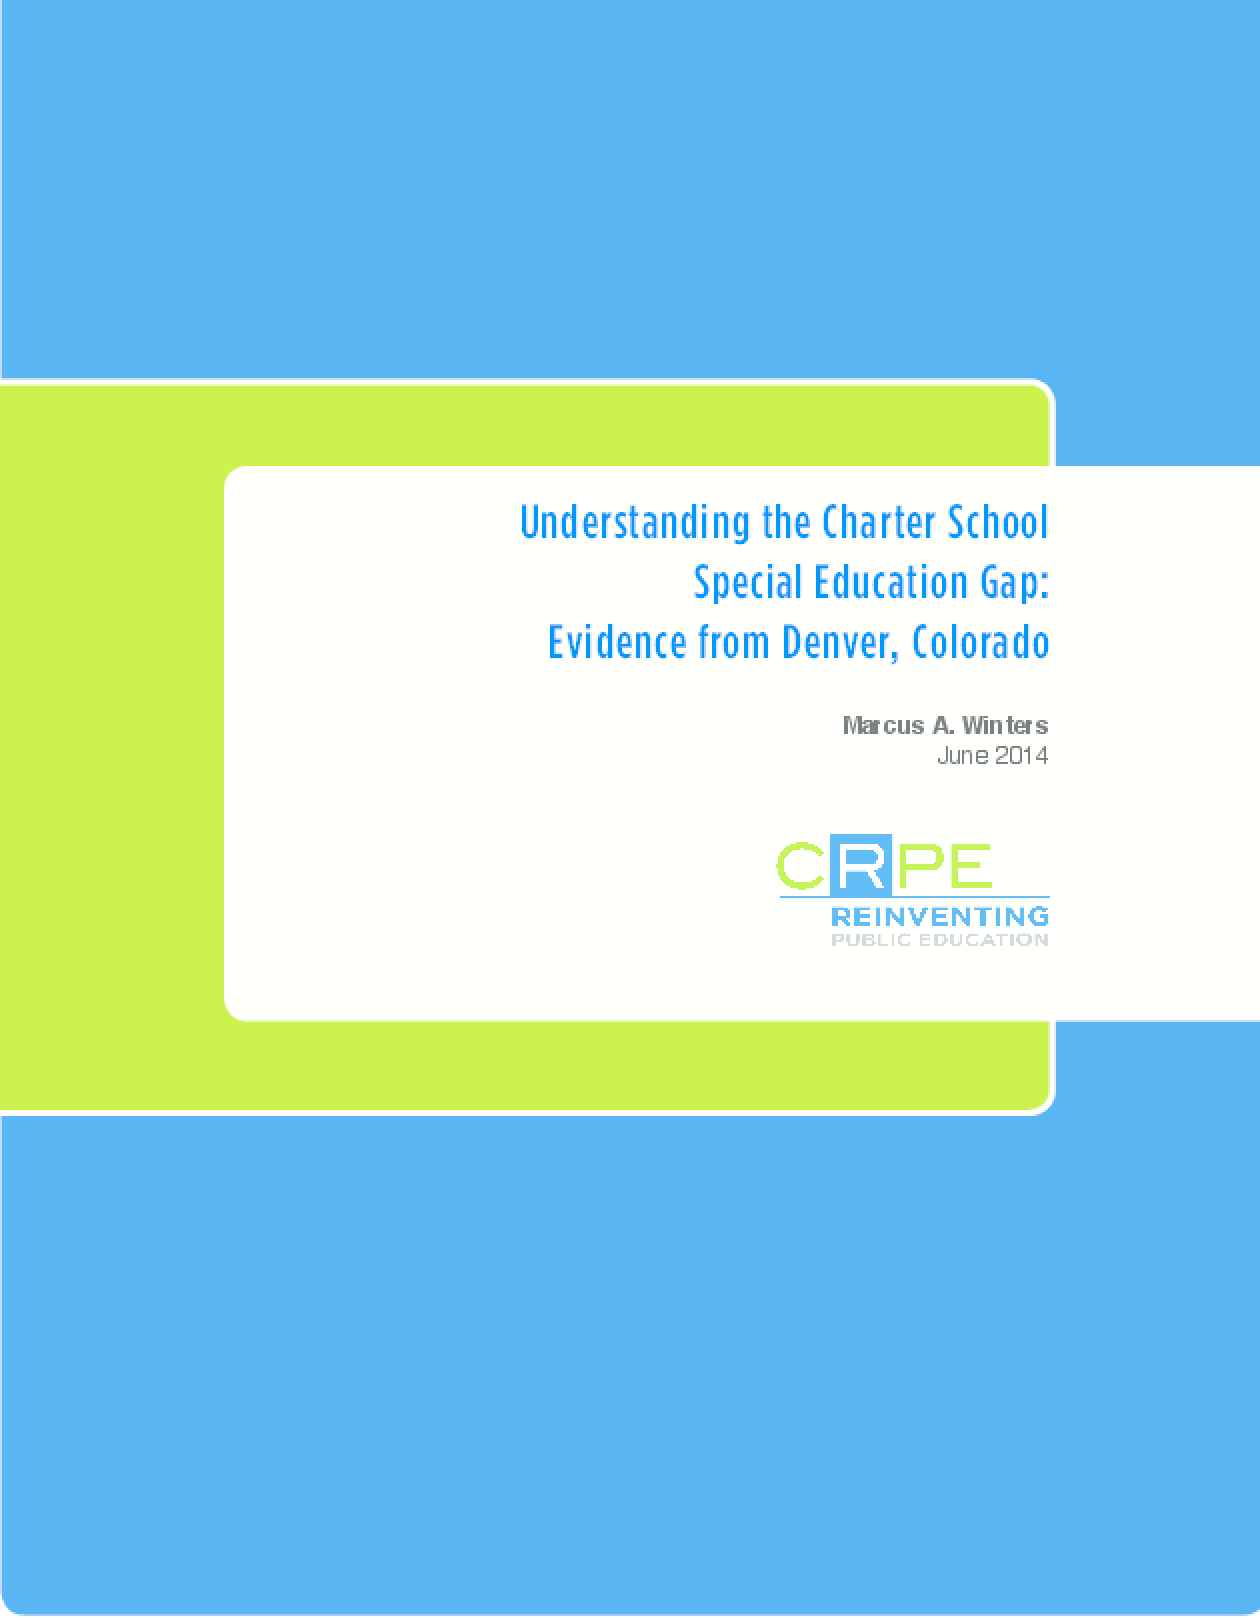 Understanding the Charter School Special Education Gap: Evidence from Denver, Colorado